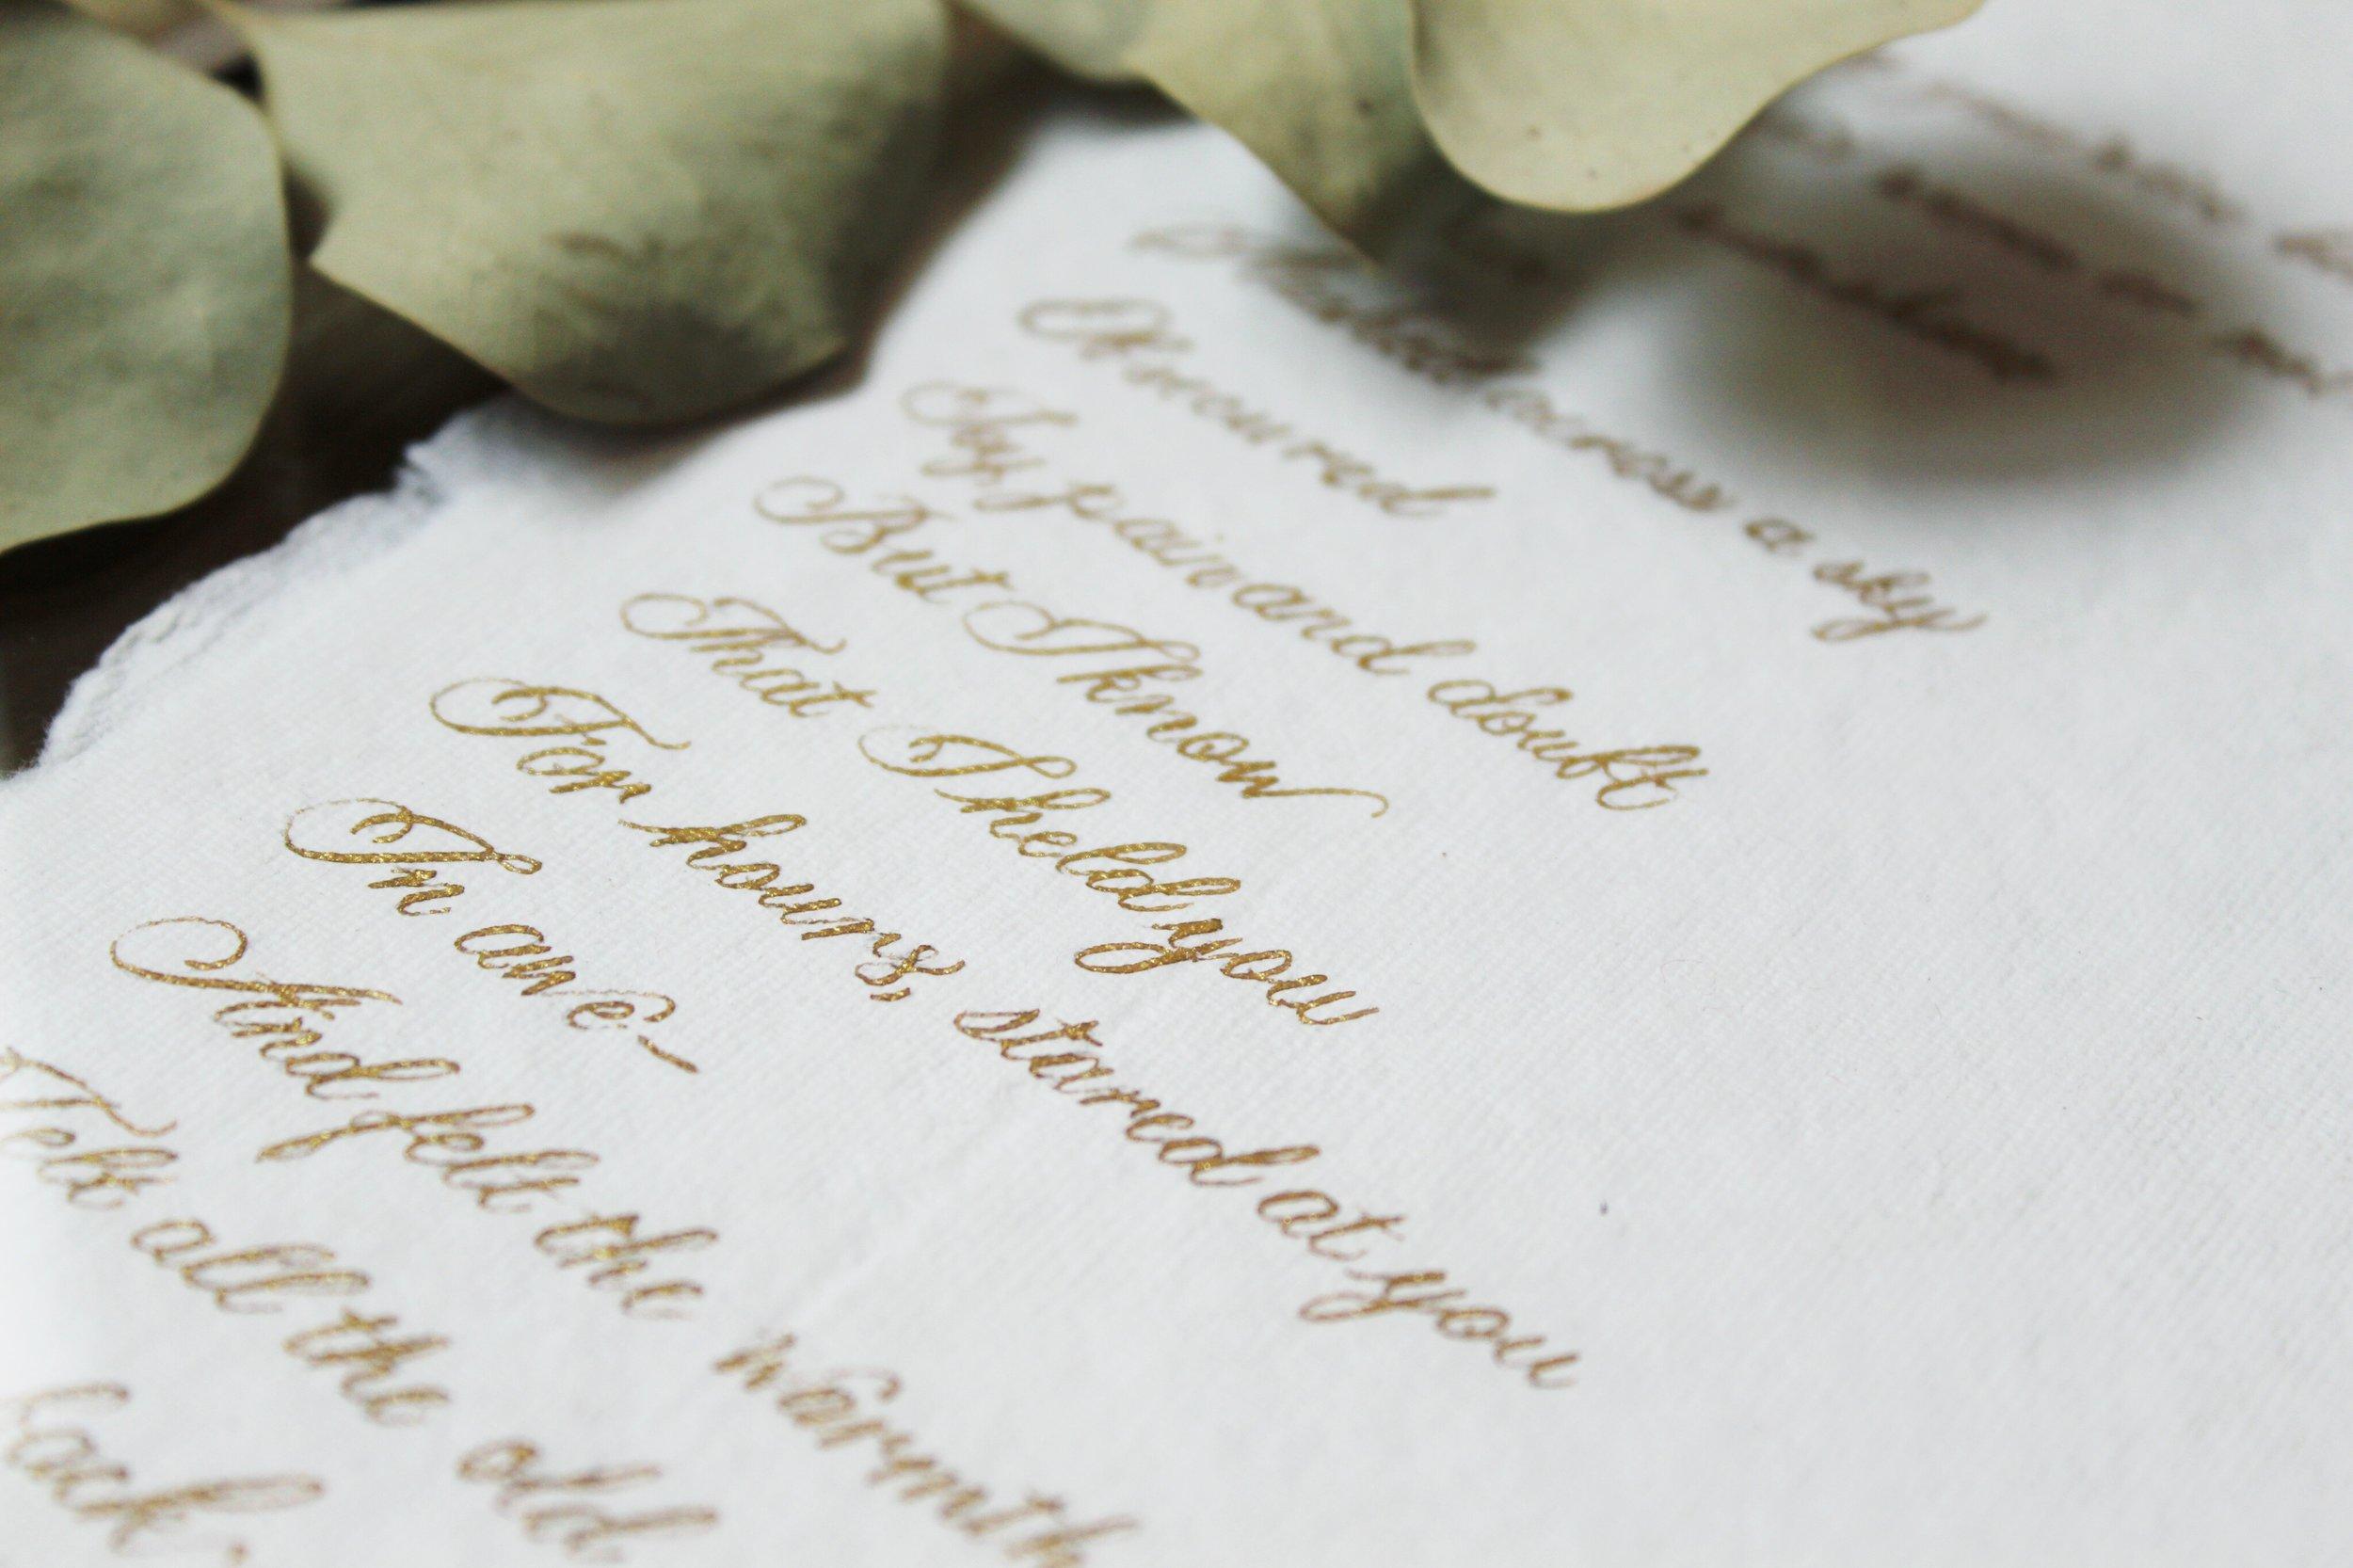 Central PA, York PA, JesSmith Designs, custom, wedding, invitations, bridal, announcements, save the date, baby, hanover, calligraphy, baltimore, wedding invitations, lancaster, gettysburg-05-10 04.55.28.jpg